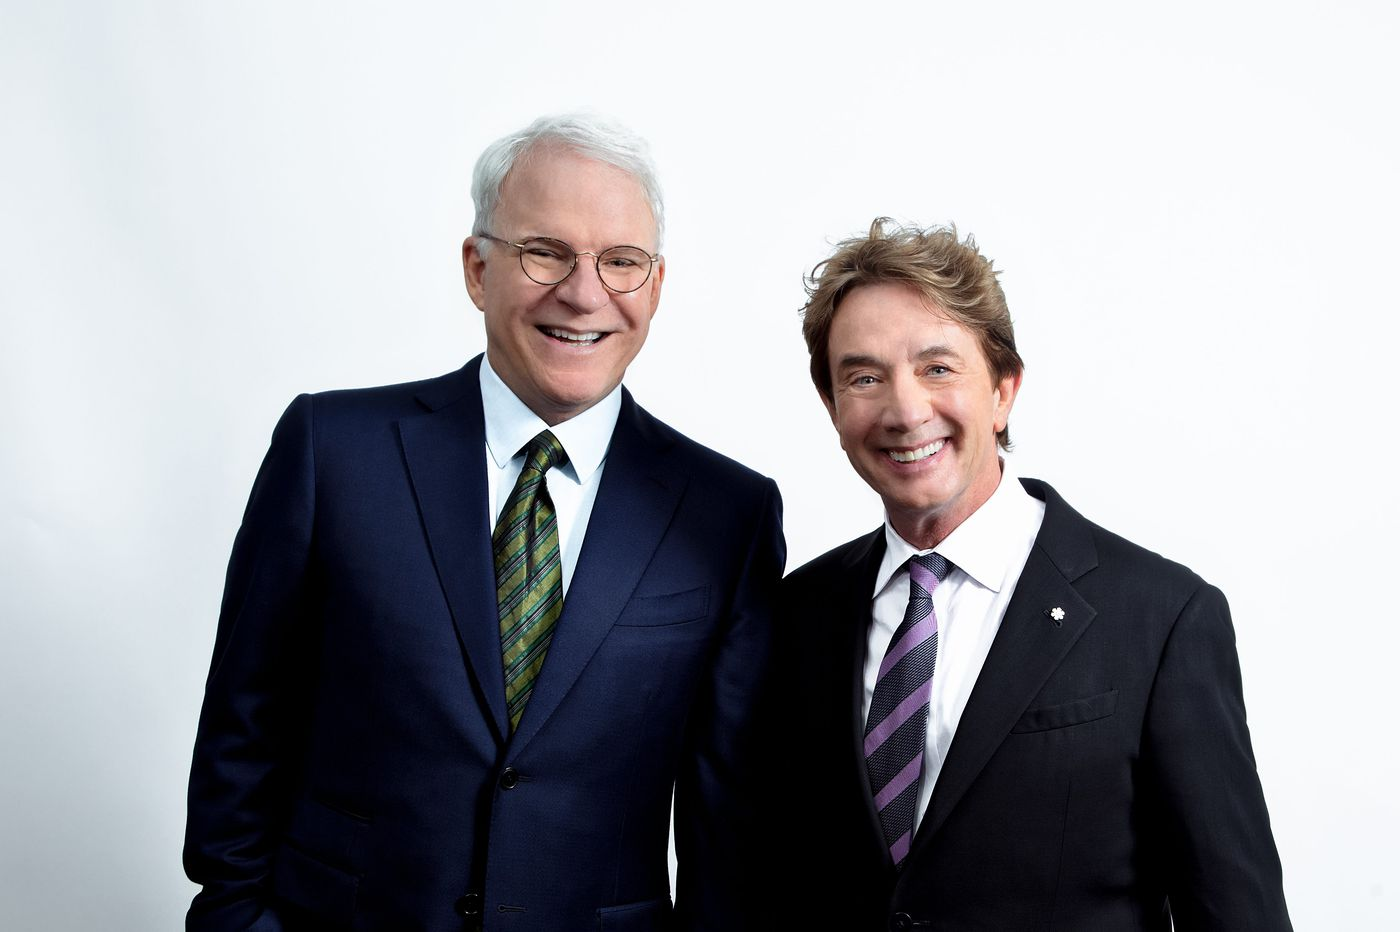 Steve Martin and Martin Short bring their musical extravaganza to the Mann Center